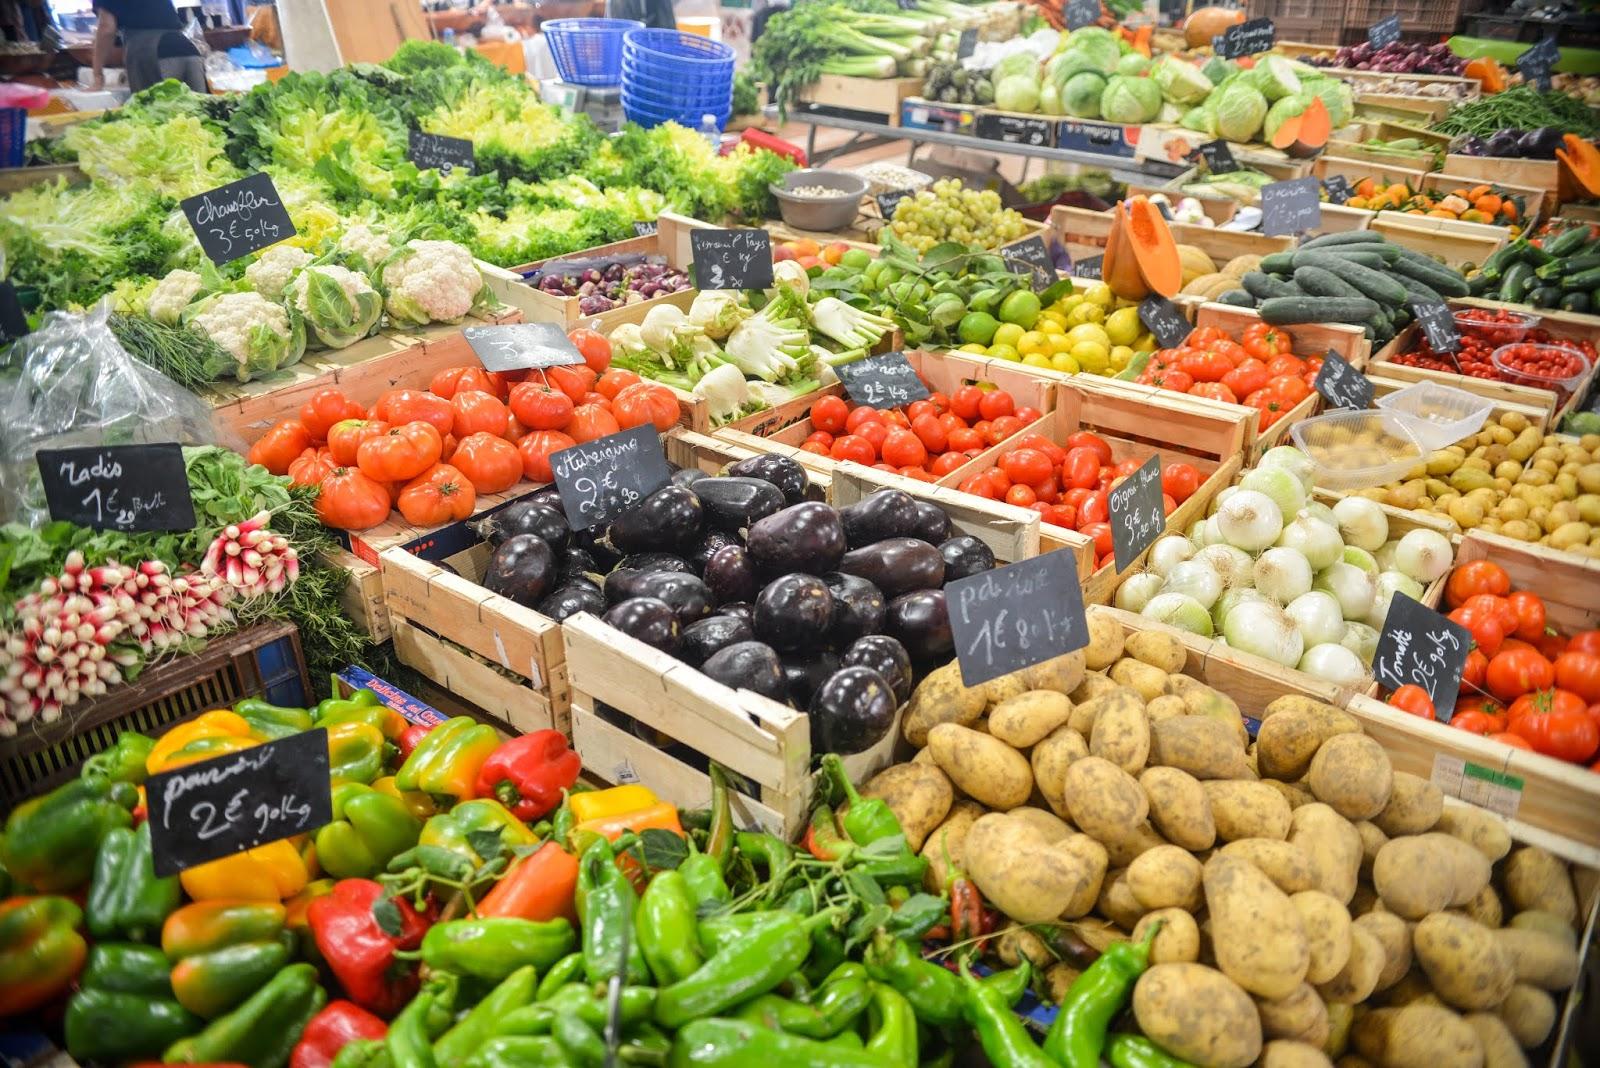 bio،bio,منتجات طبيعية,منتجات bio,طبيعية,منتجات,مغربية,مشتريات,منتجات طبيعية 100%,ماسكات,نبيل,مكياج رخيص,ماسك للشعر,منتجات طبيعية للشعر,العياشي,منتجات خيصة,مستحضرات طبيعية,منتجات طبيعية للبشرة,منتجات طبيعية مغربية,مكياج,منتجات العناية,منتجات أبو سعد